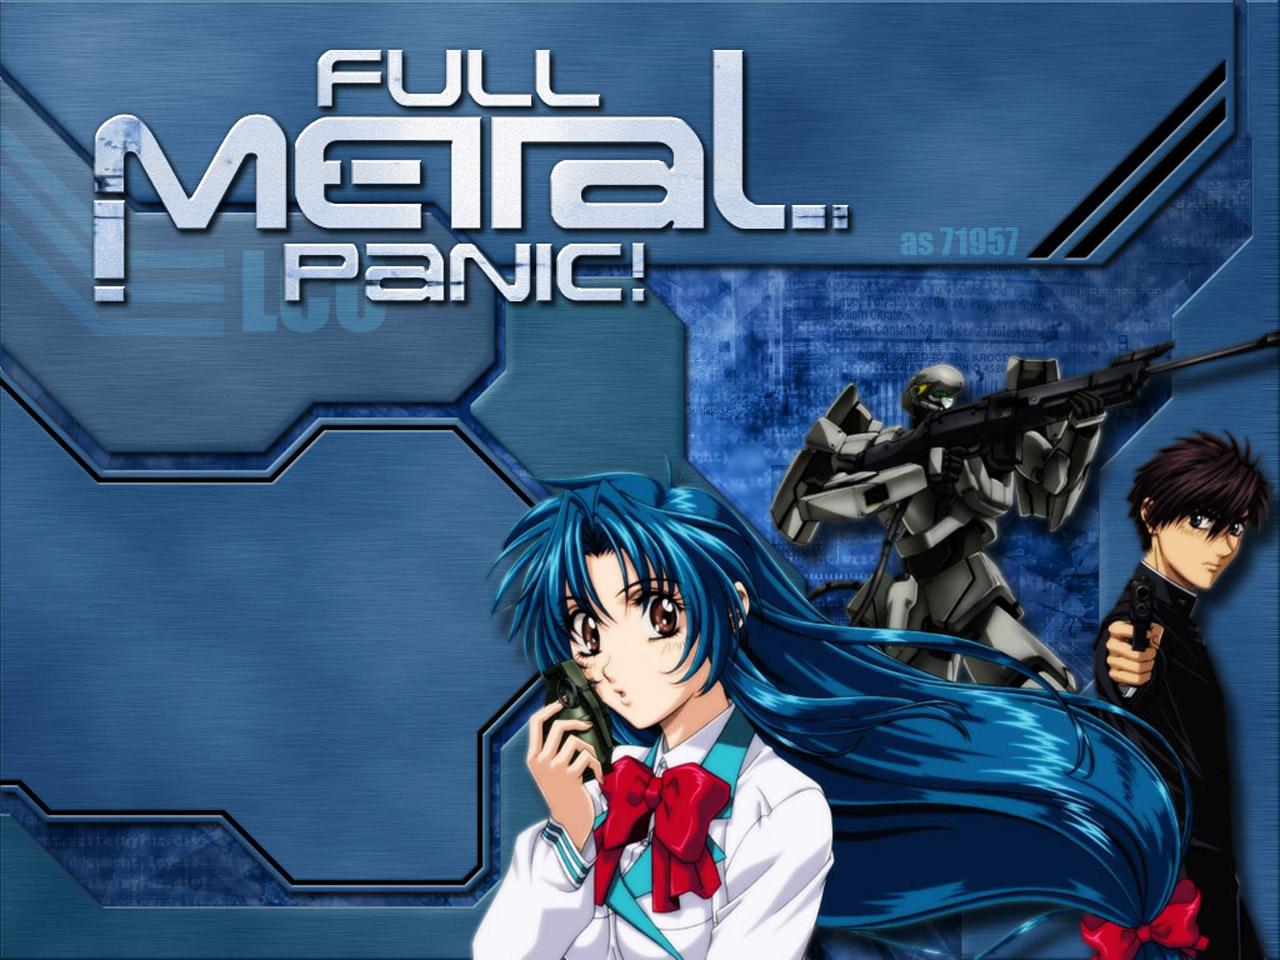 http://imagesdefonds.free.fr/anime/Full_Metal_Panic/full_metal_panic_1280_014.jpg